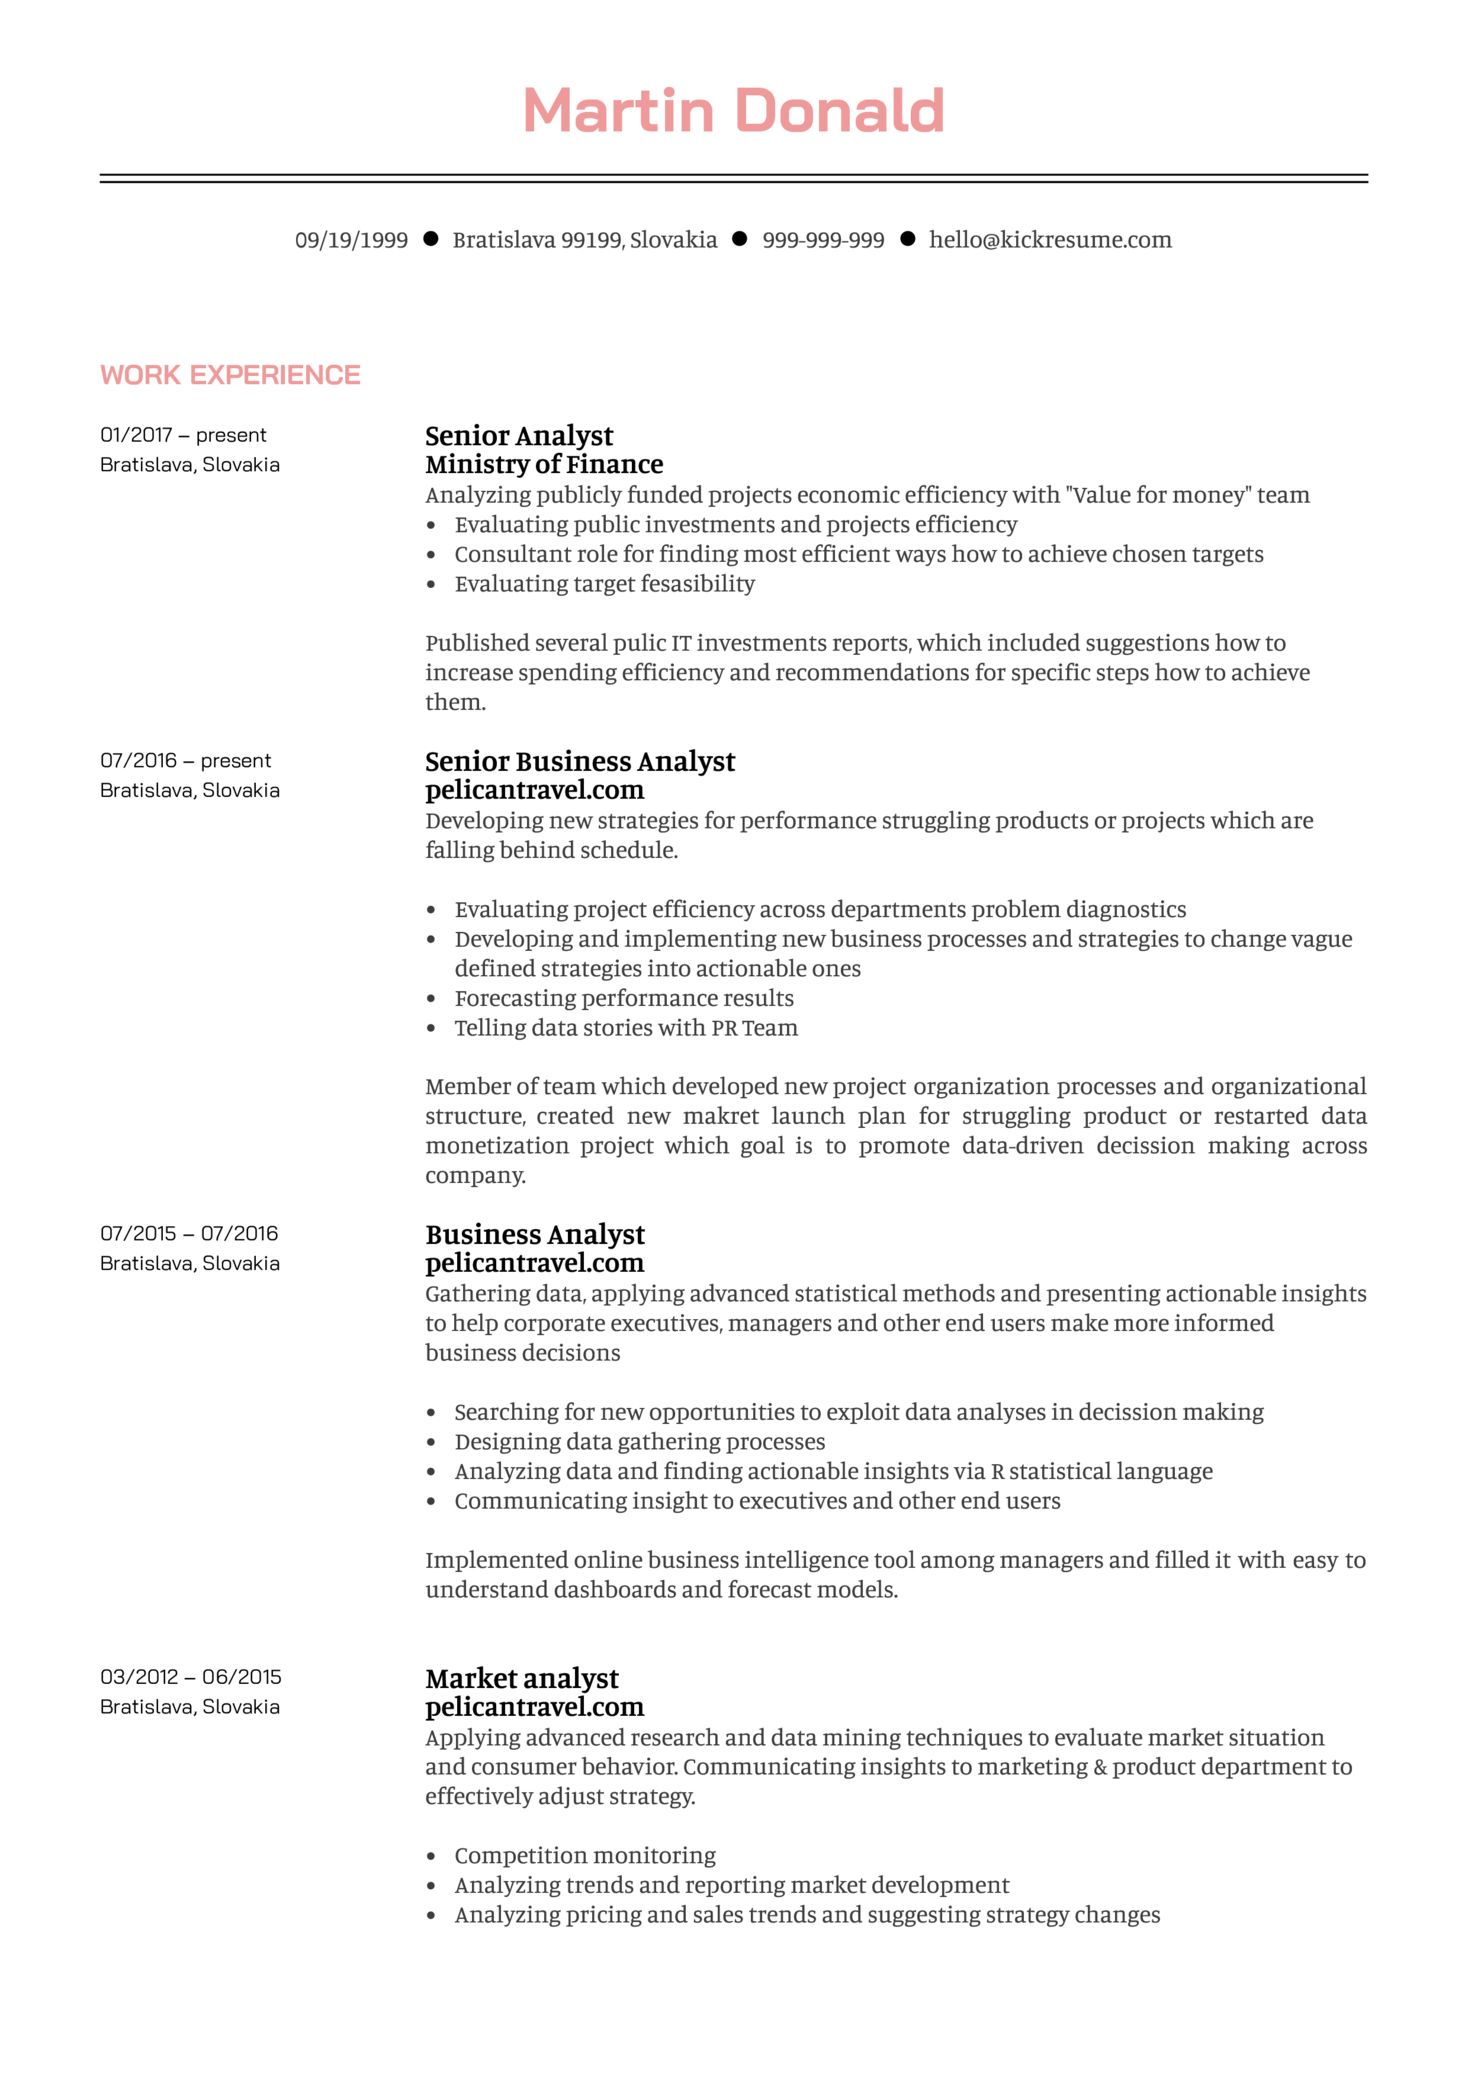 Senior Business Analyst Resume Example (Part 1)